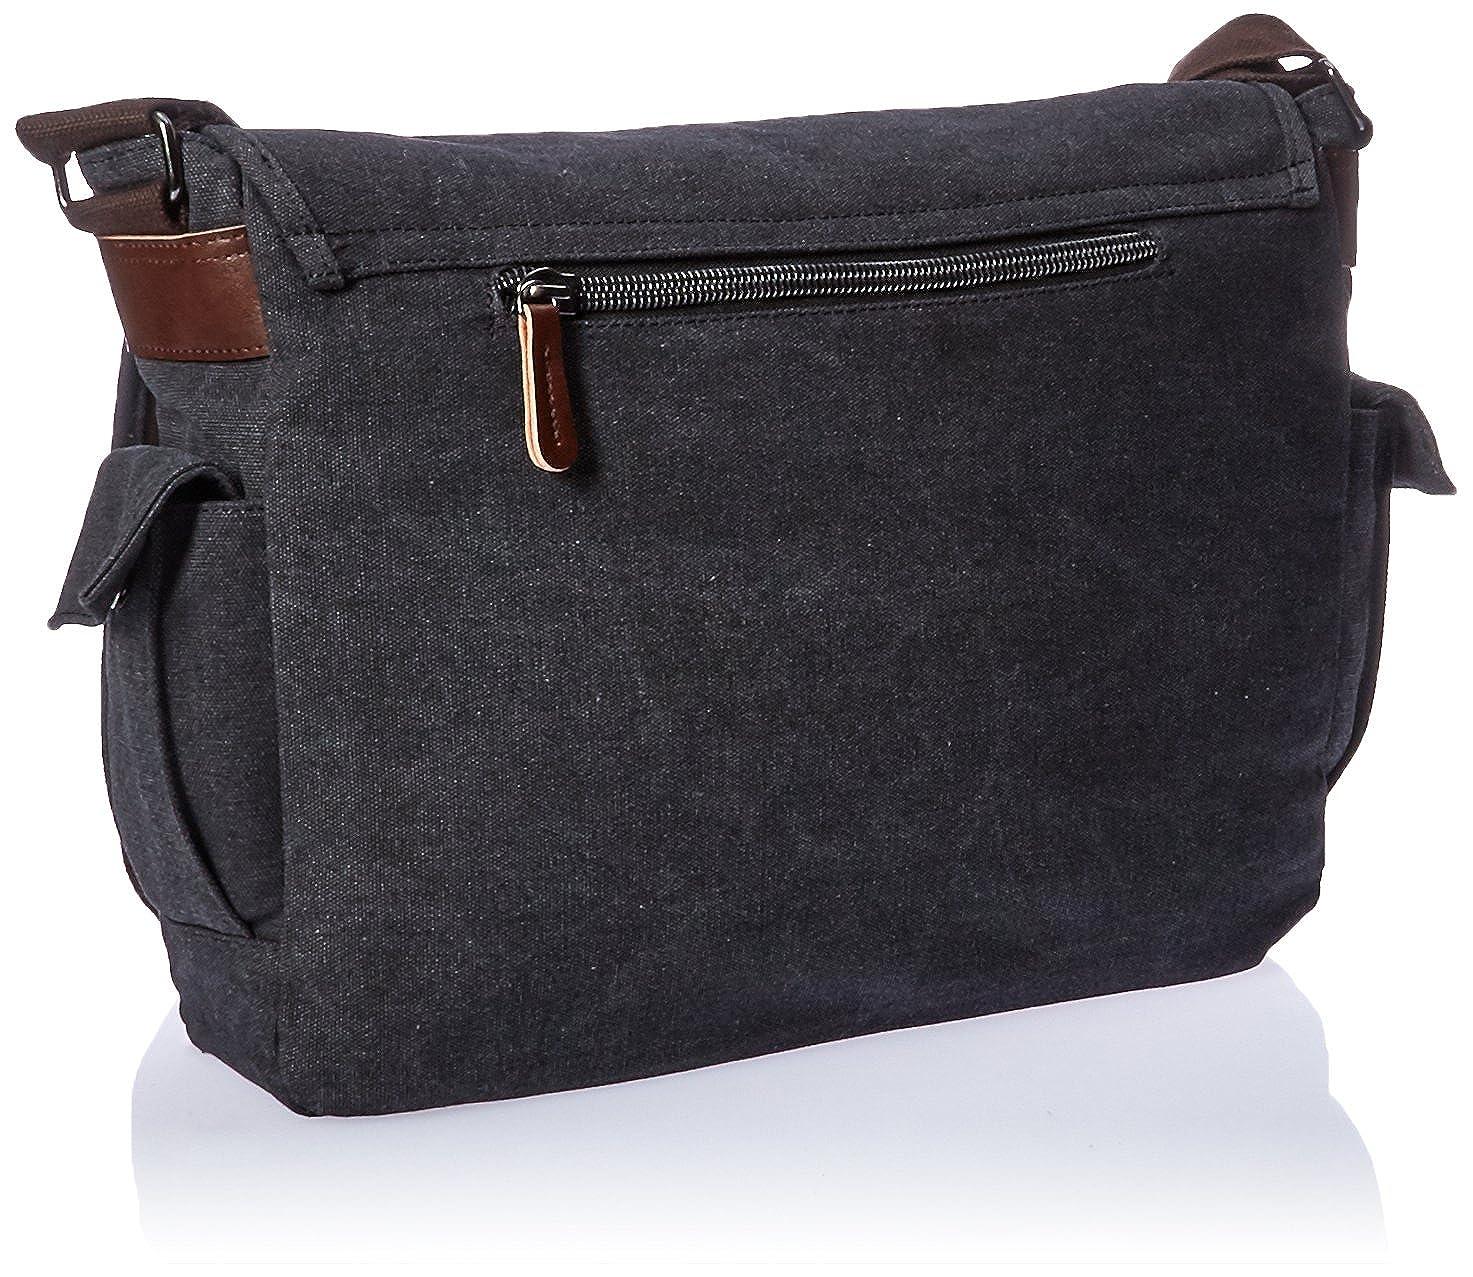 635483a1ca Amazon.com  ZUOLUNDUO Vintage Canvas Laptop Messenger Bag School Bag ...